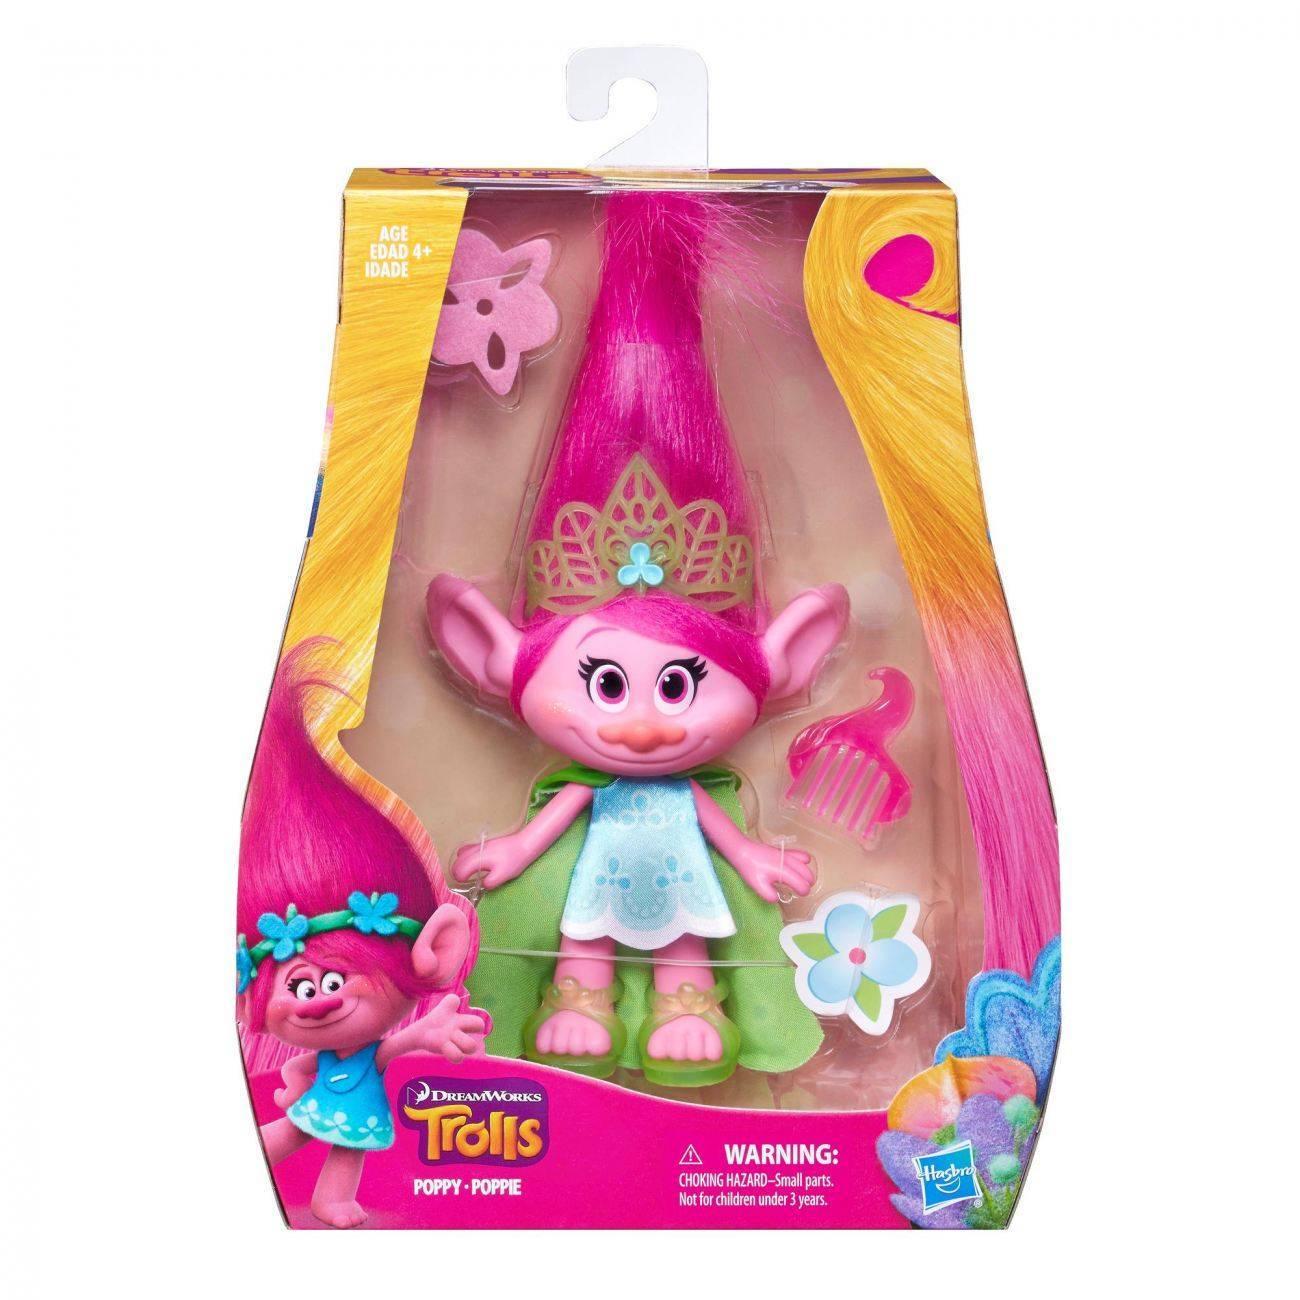 43aa06439bea Тролль среднего размера (в асс), игрушка Hasbro Trolls B6561 ...